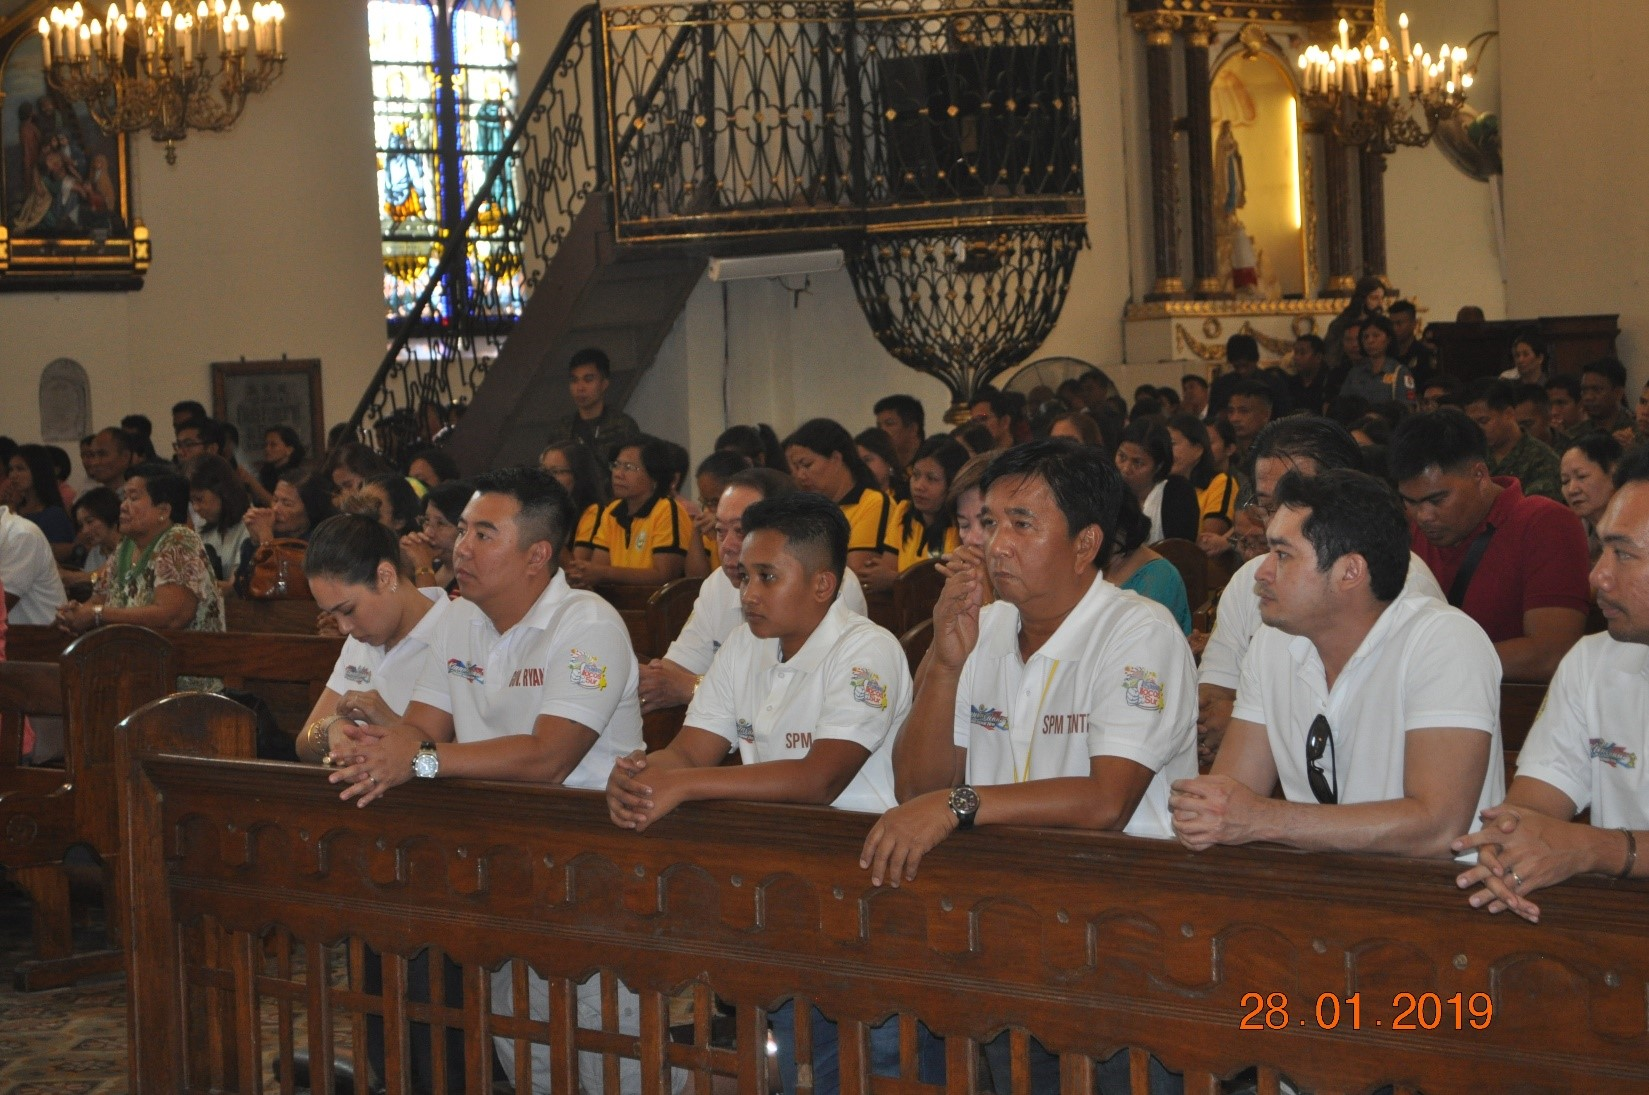 Nasantuan a Misa kas panangirugi ti Ilocos Kannawidan Festival a panangrambak ti maika-201 nga anibersario ti probinsia nga Ilocos Sur. (photo by Eden A. Alviar)